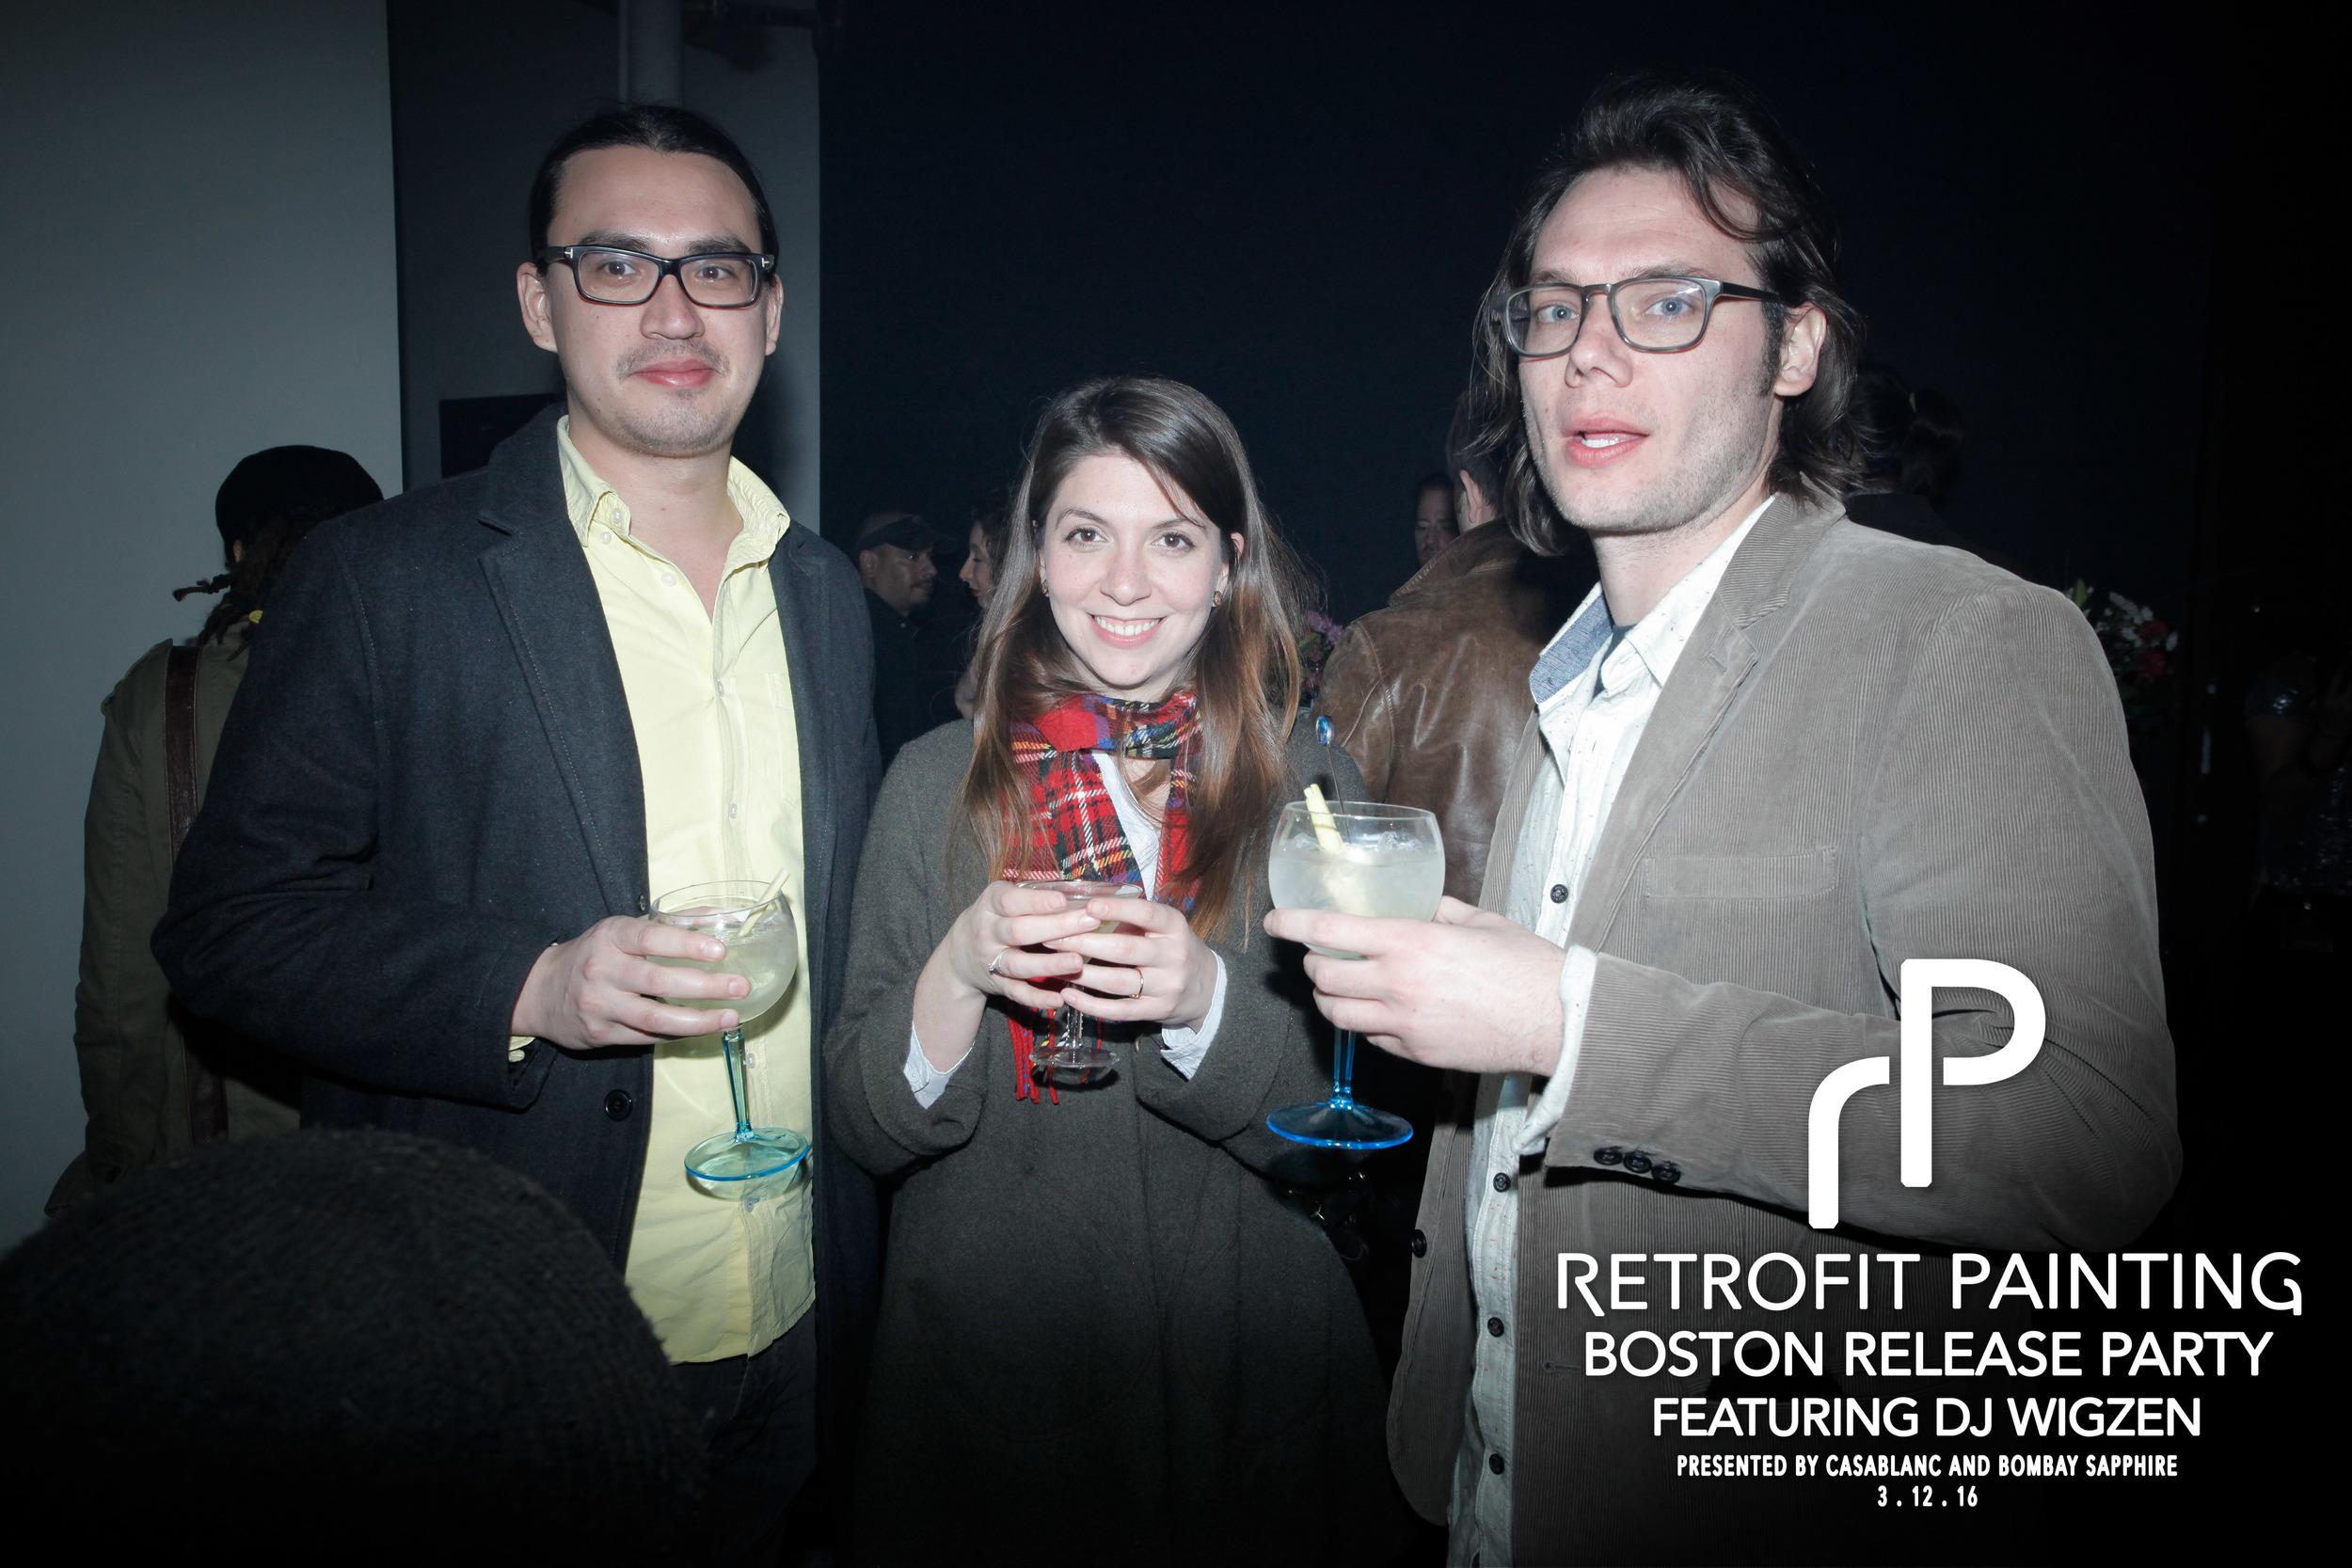 Retrofit Painting Boston Release Party 0056.jpg